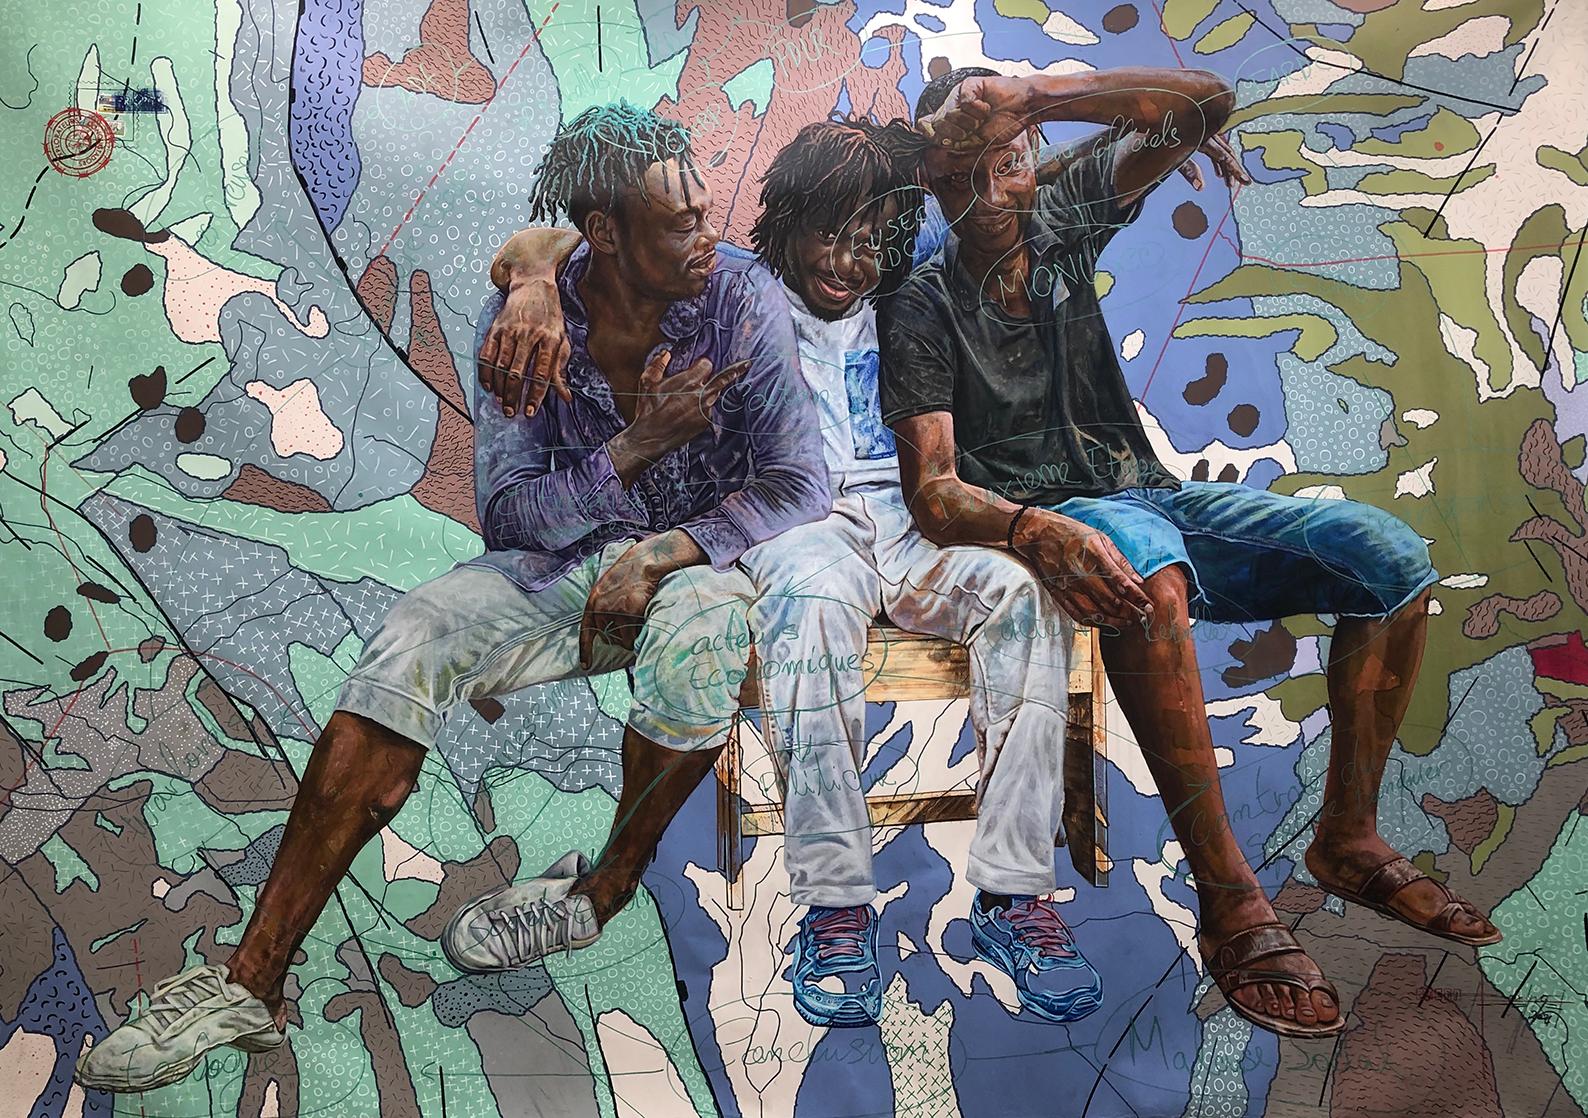 Jean David Nkot, 'P.O.Box The hope of the soul' 2021, acrylic, posca on canvas. Courtesy of AFIKARIS Gallery